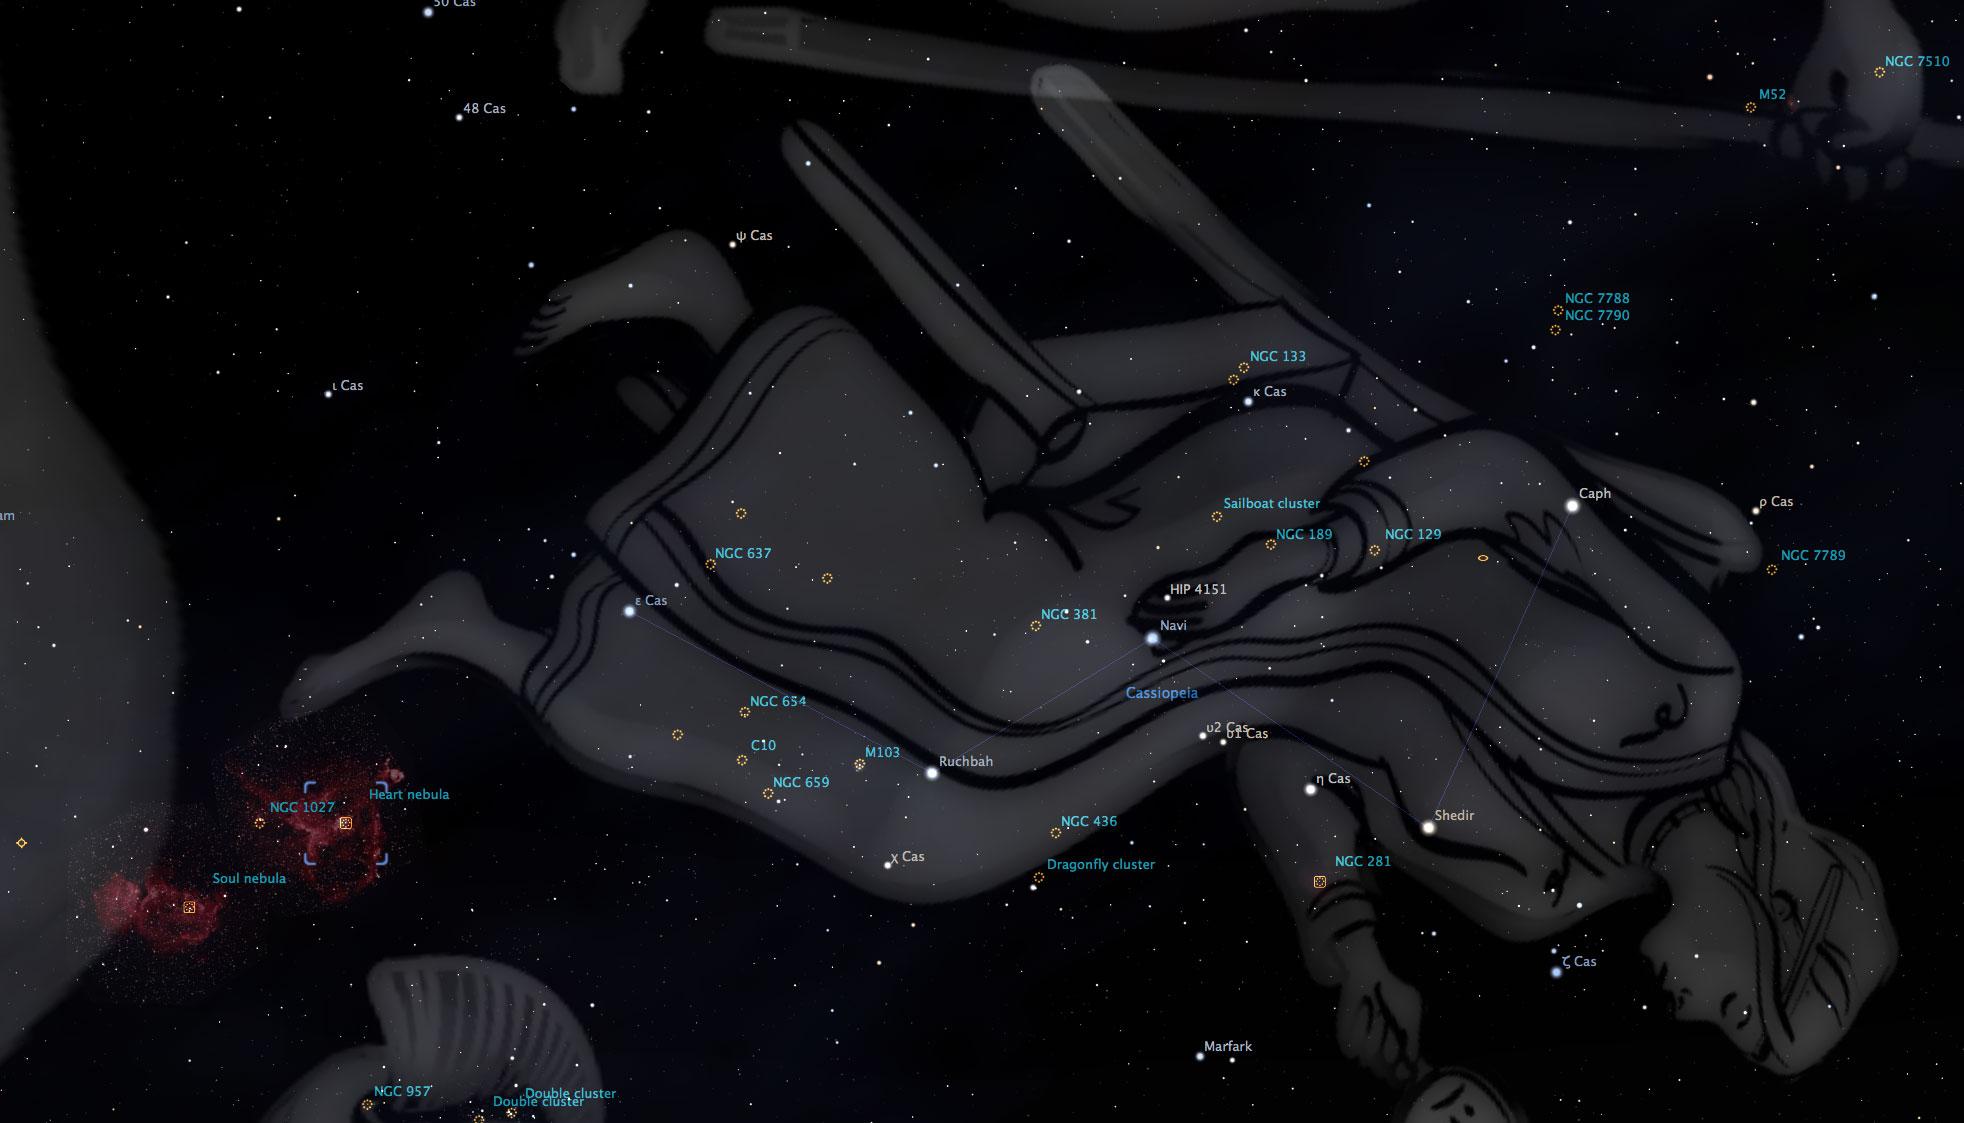 The Cassiopeia star field. Credit: Stellarium